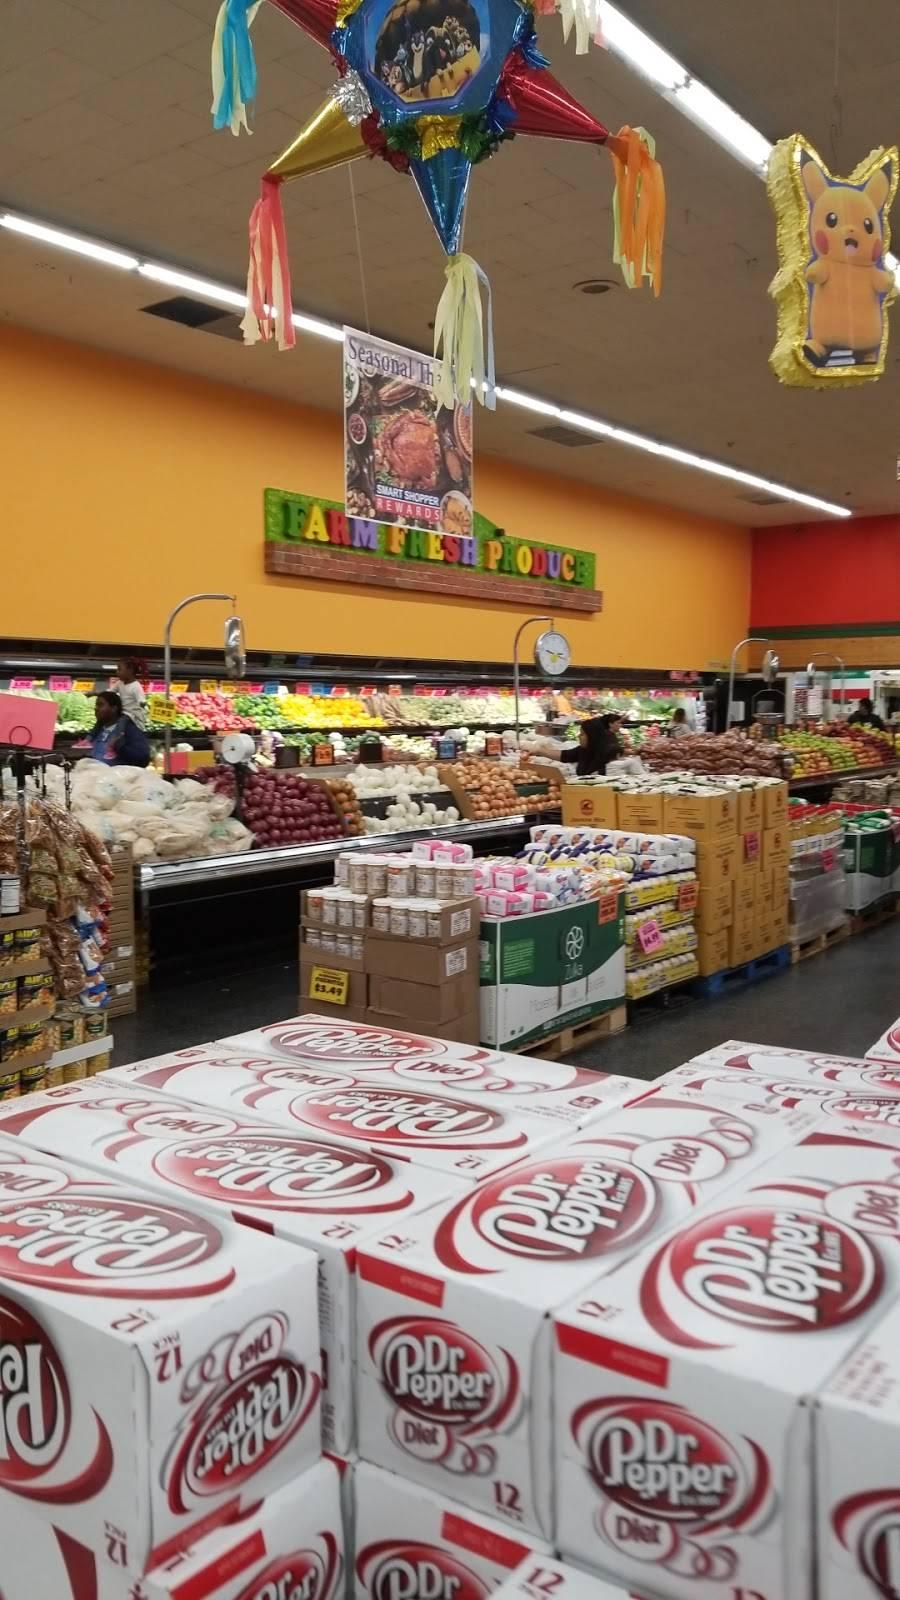 Foodland San Diego CA - supermarket    Photo 6 of 10   Address: 5075 Federal Blvd, San Diego, CA 92102, USA   Phone: (619) 262-9992